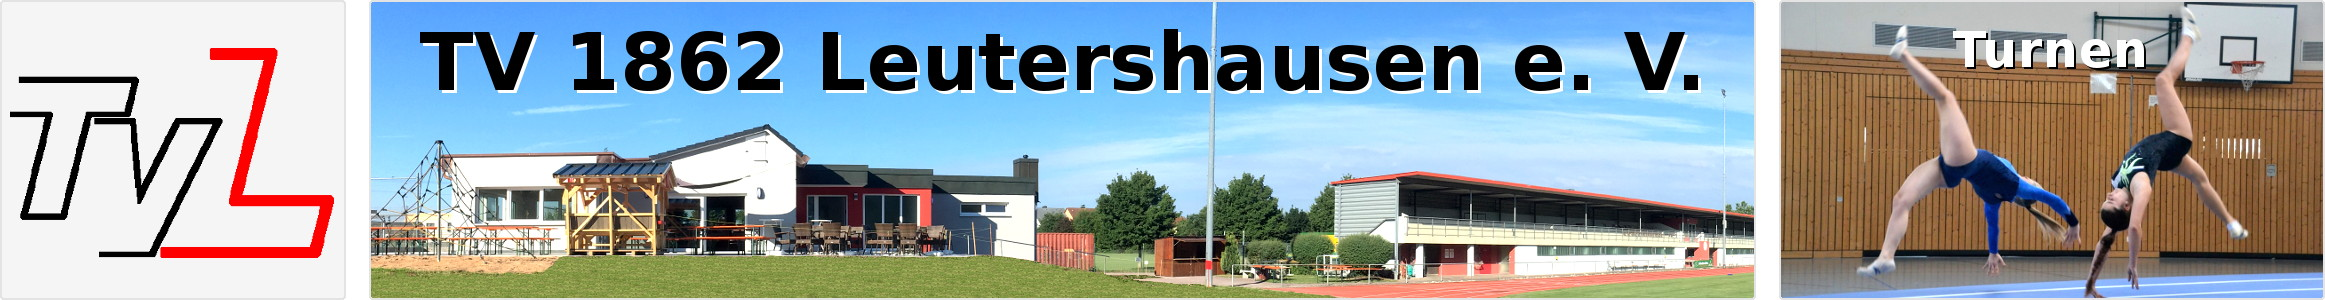 TV 1862 Leutershausen e.V.